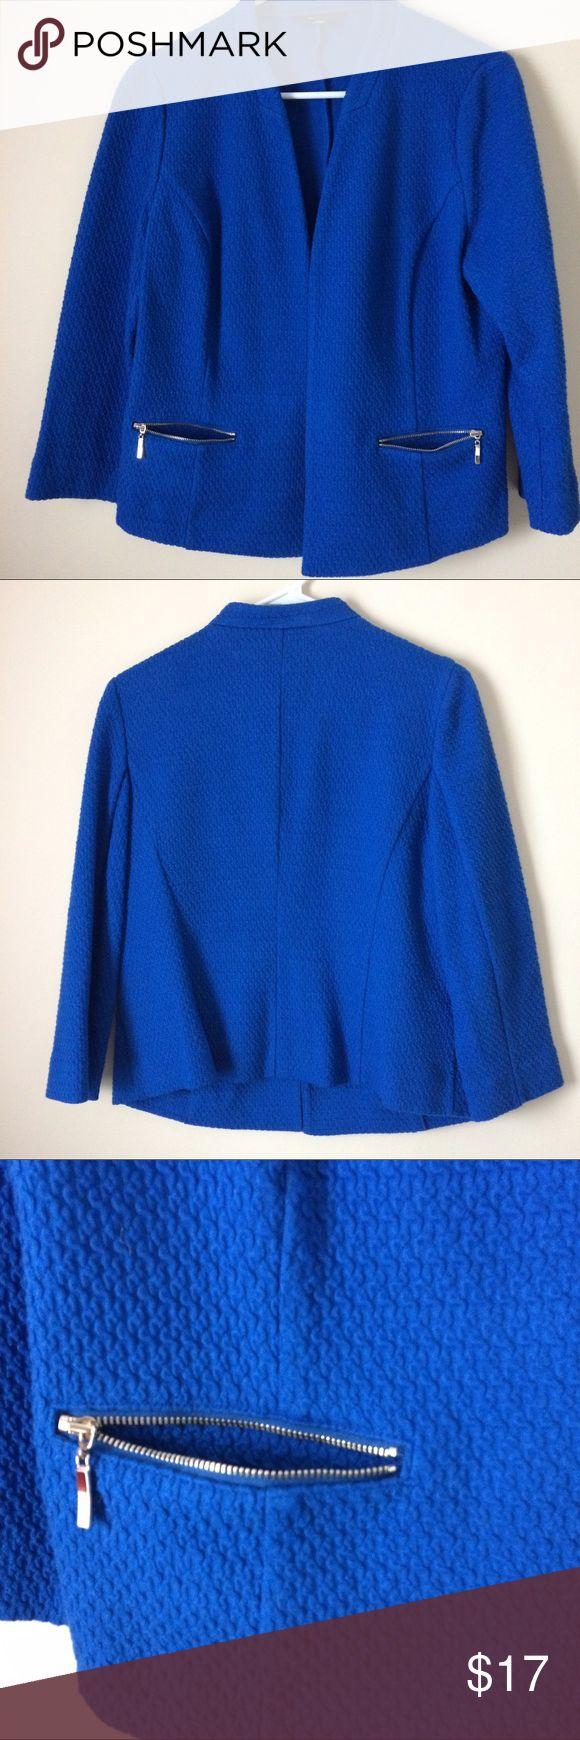 Royal blue cotton blazer Beautiful Alfani royal blue textured cotton open blazer. Double zip pockets on front. 3/4 sleeve length. Size 10 Alfani Tops